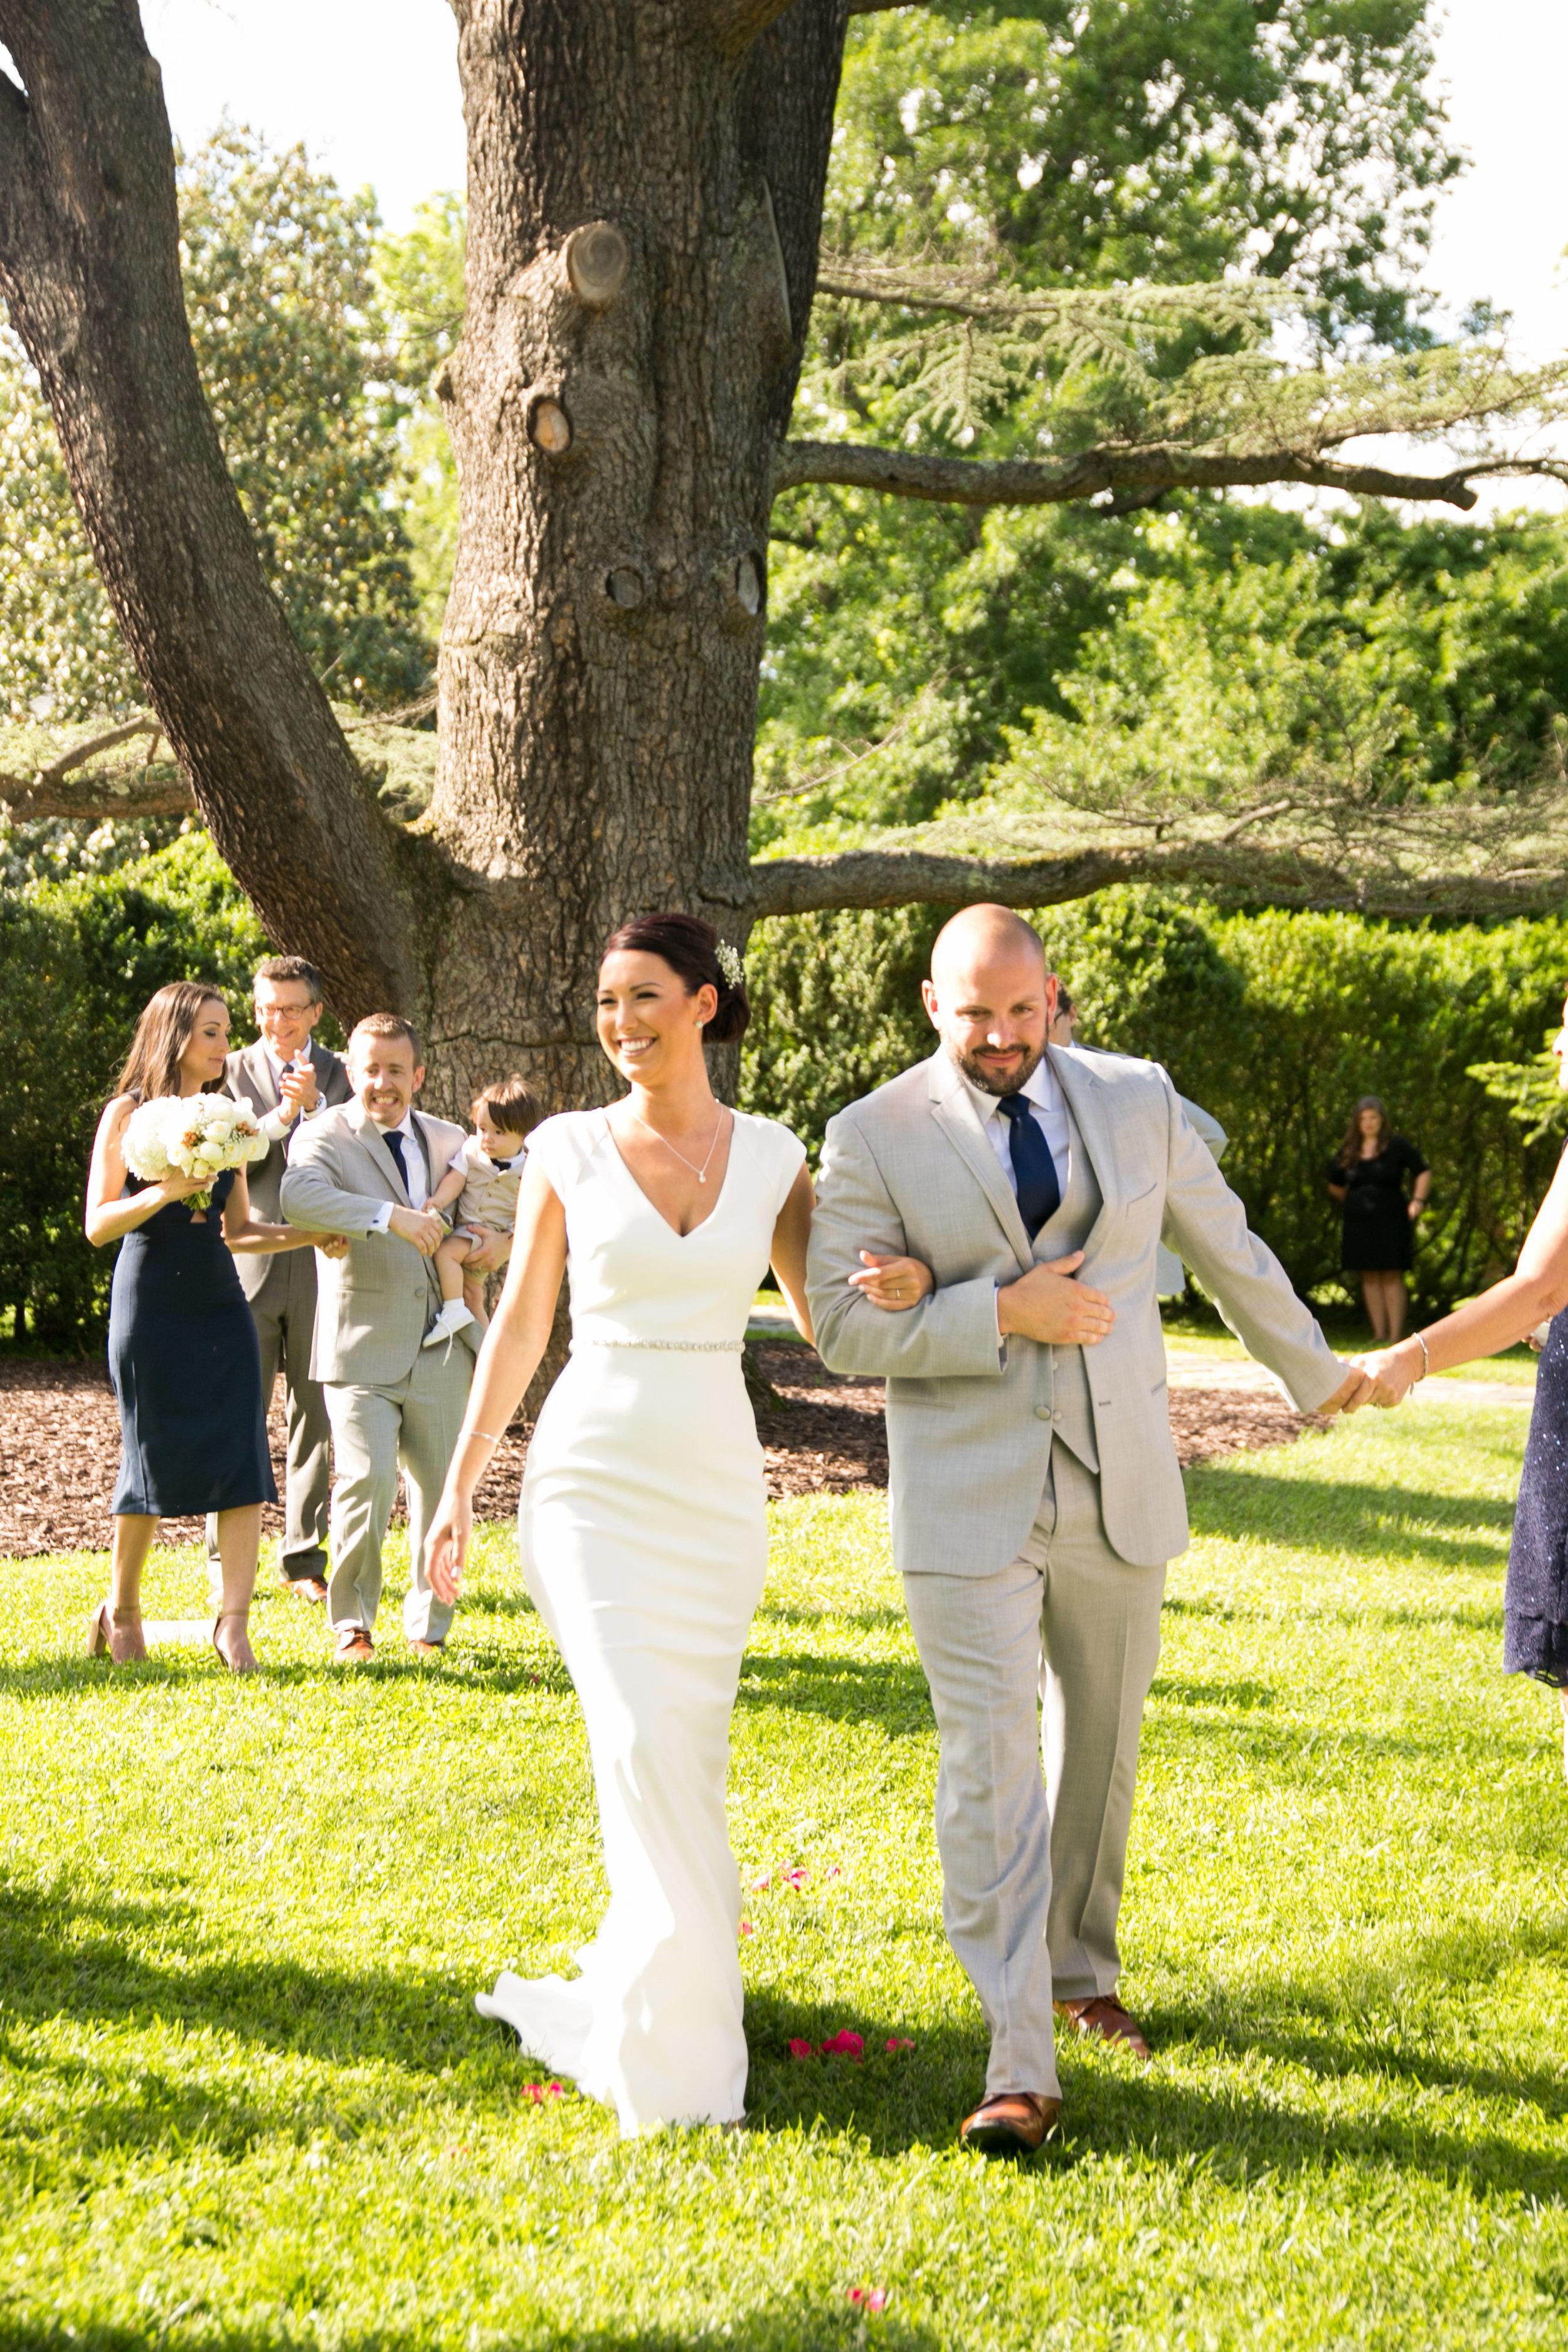 Pure elegance events Tynise Kee dc wedding planner va wedding planner rust manor house leesburg -0045.jpg